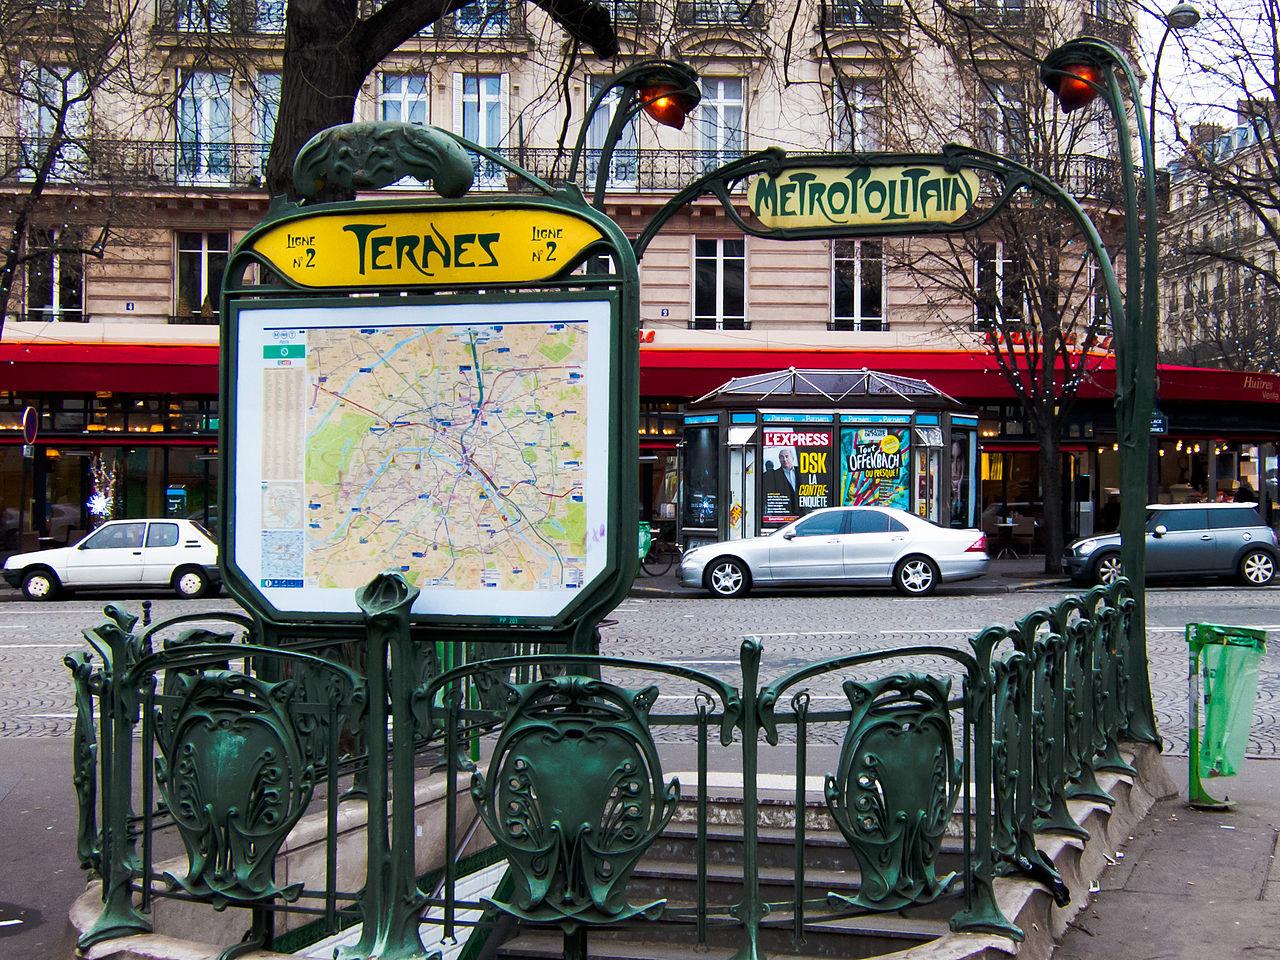 File:Ternes Metro, Paris January 2013.jpg - Wikimedia Commons